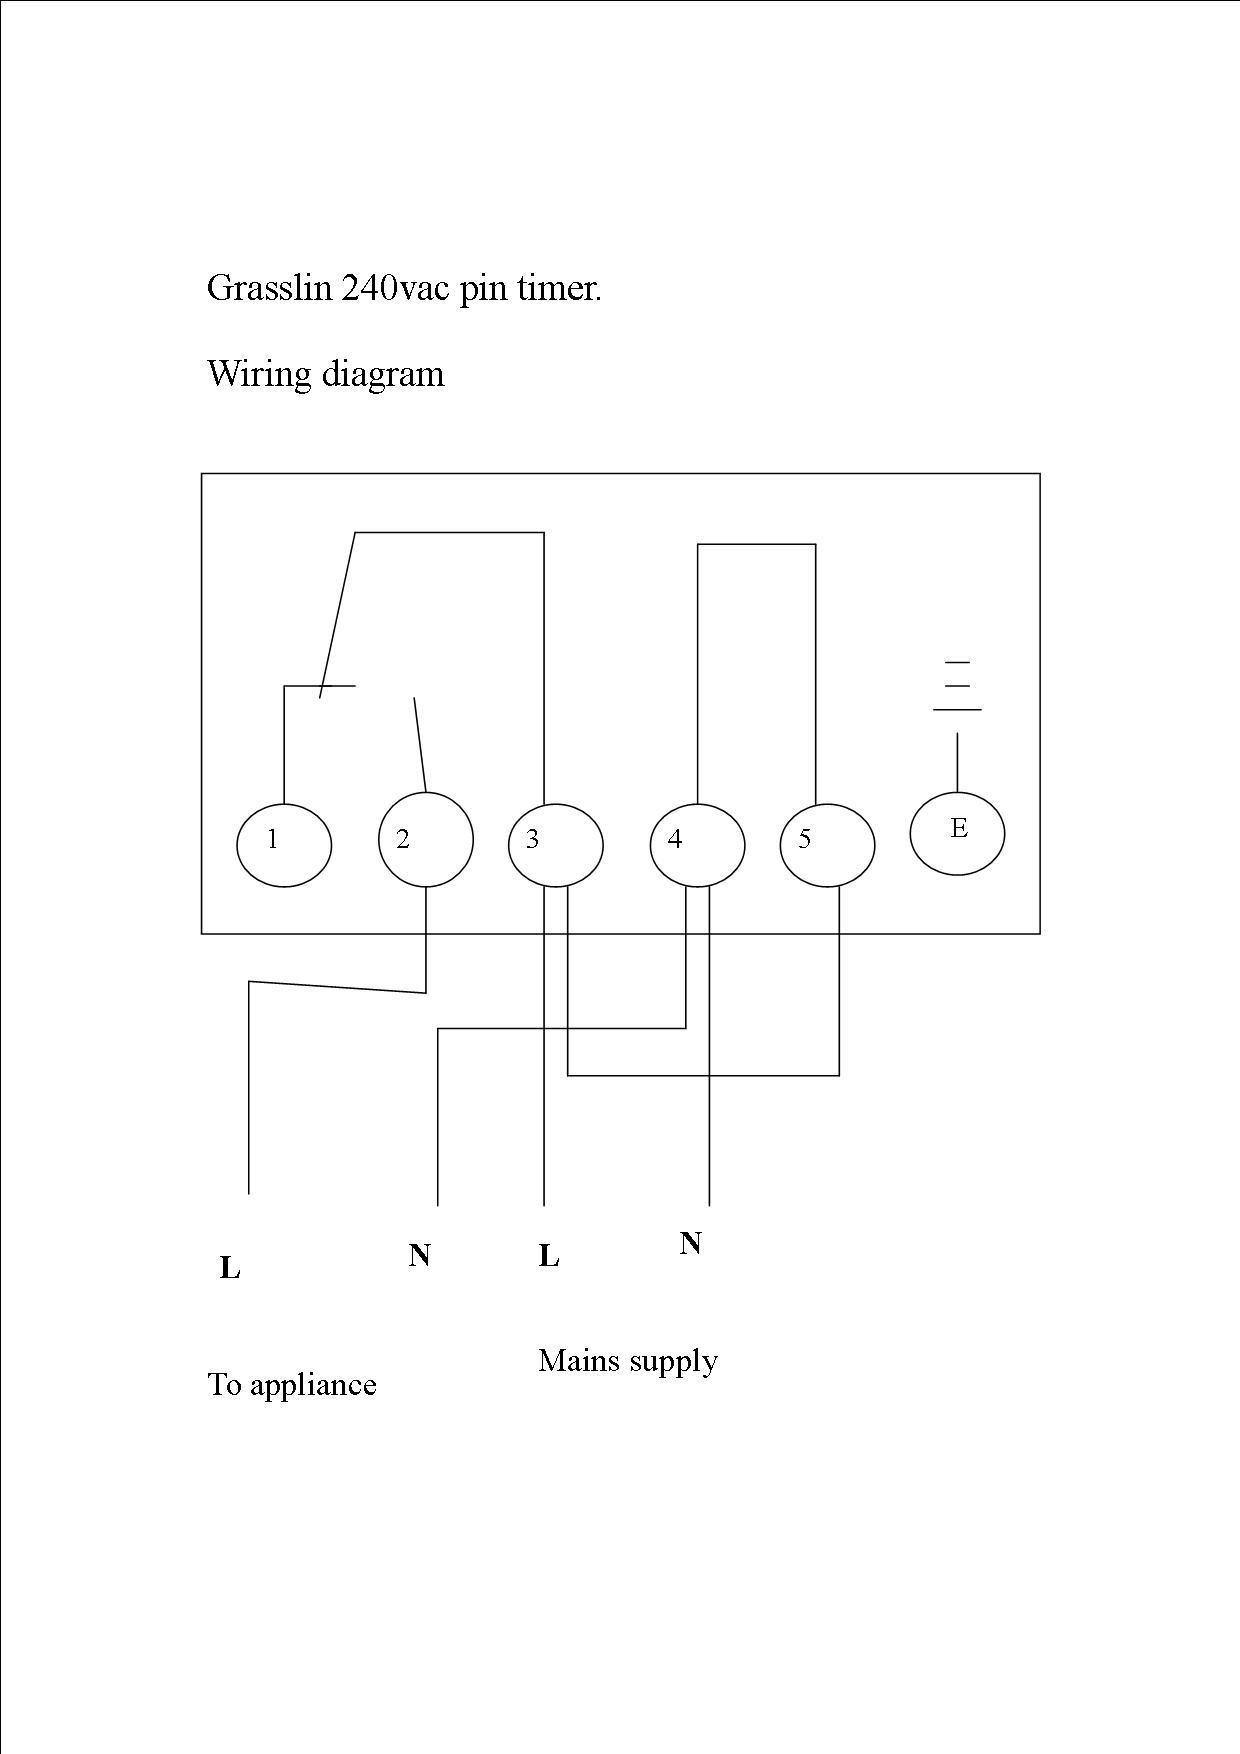 Lighting Time Clock Wiring Diagram probleme audi a4 voyant